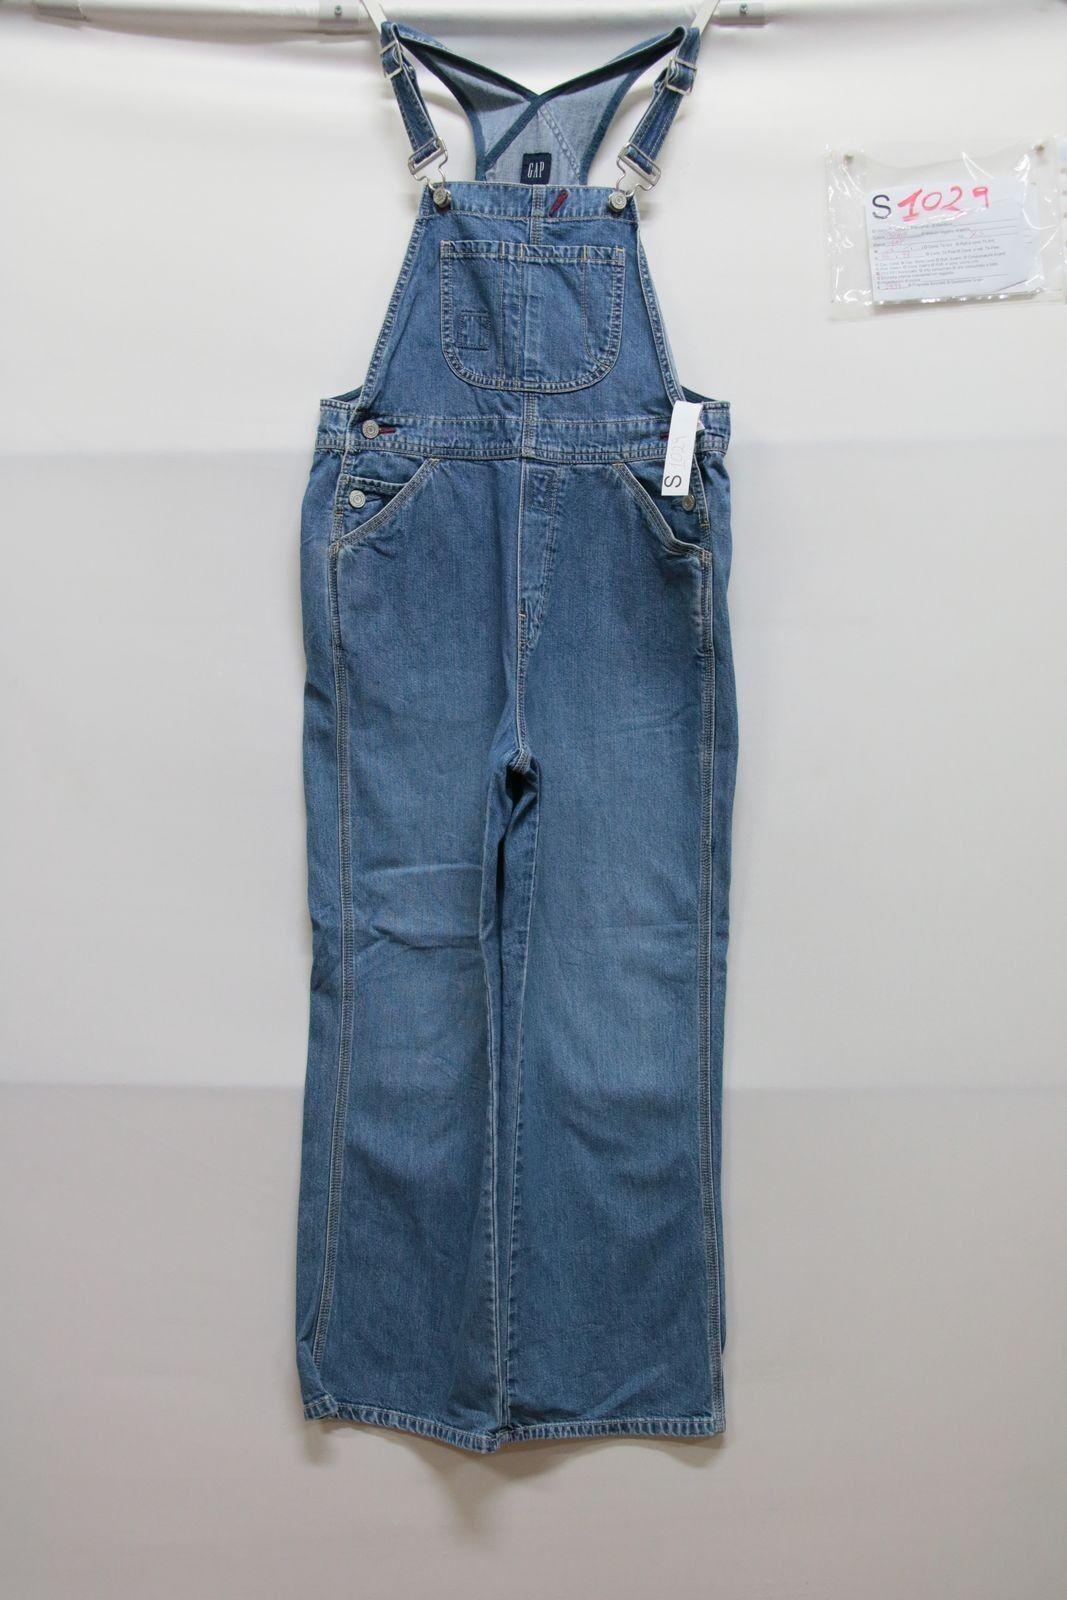 Salopette GAP (Cod. S1029) Tg XS jeans usato vintage Streetwear salopet